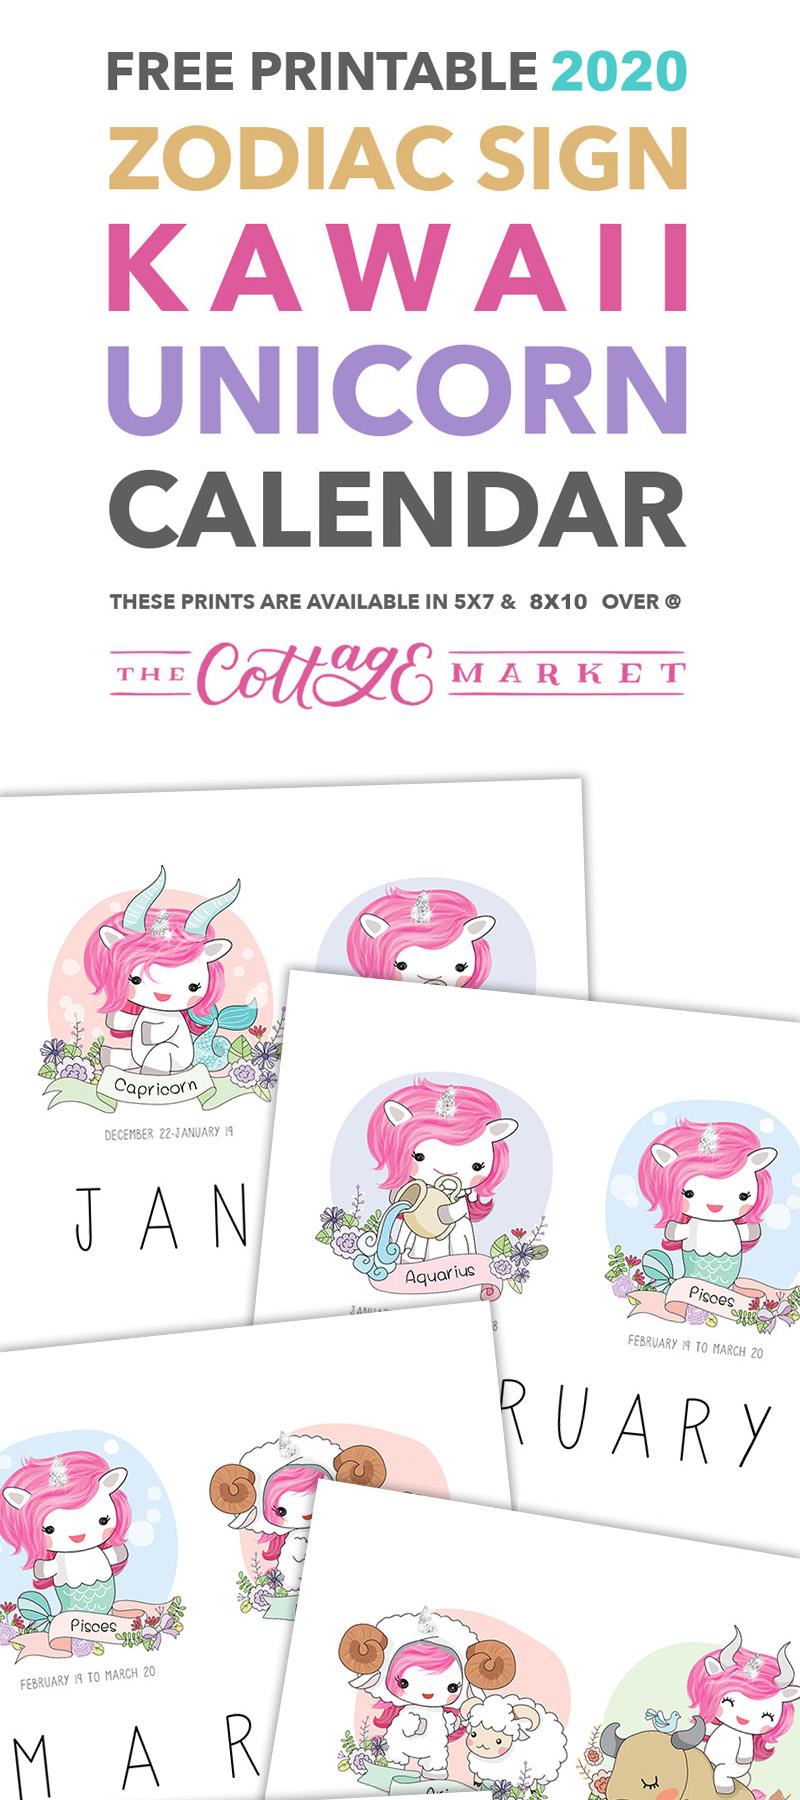 https://thecottagemarket.com/wp-content/uploads/2019/12/TCM-2020-Unicorn-Zodiac-Calendar-T-1.jpg